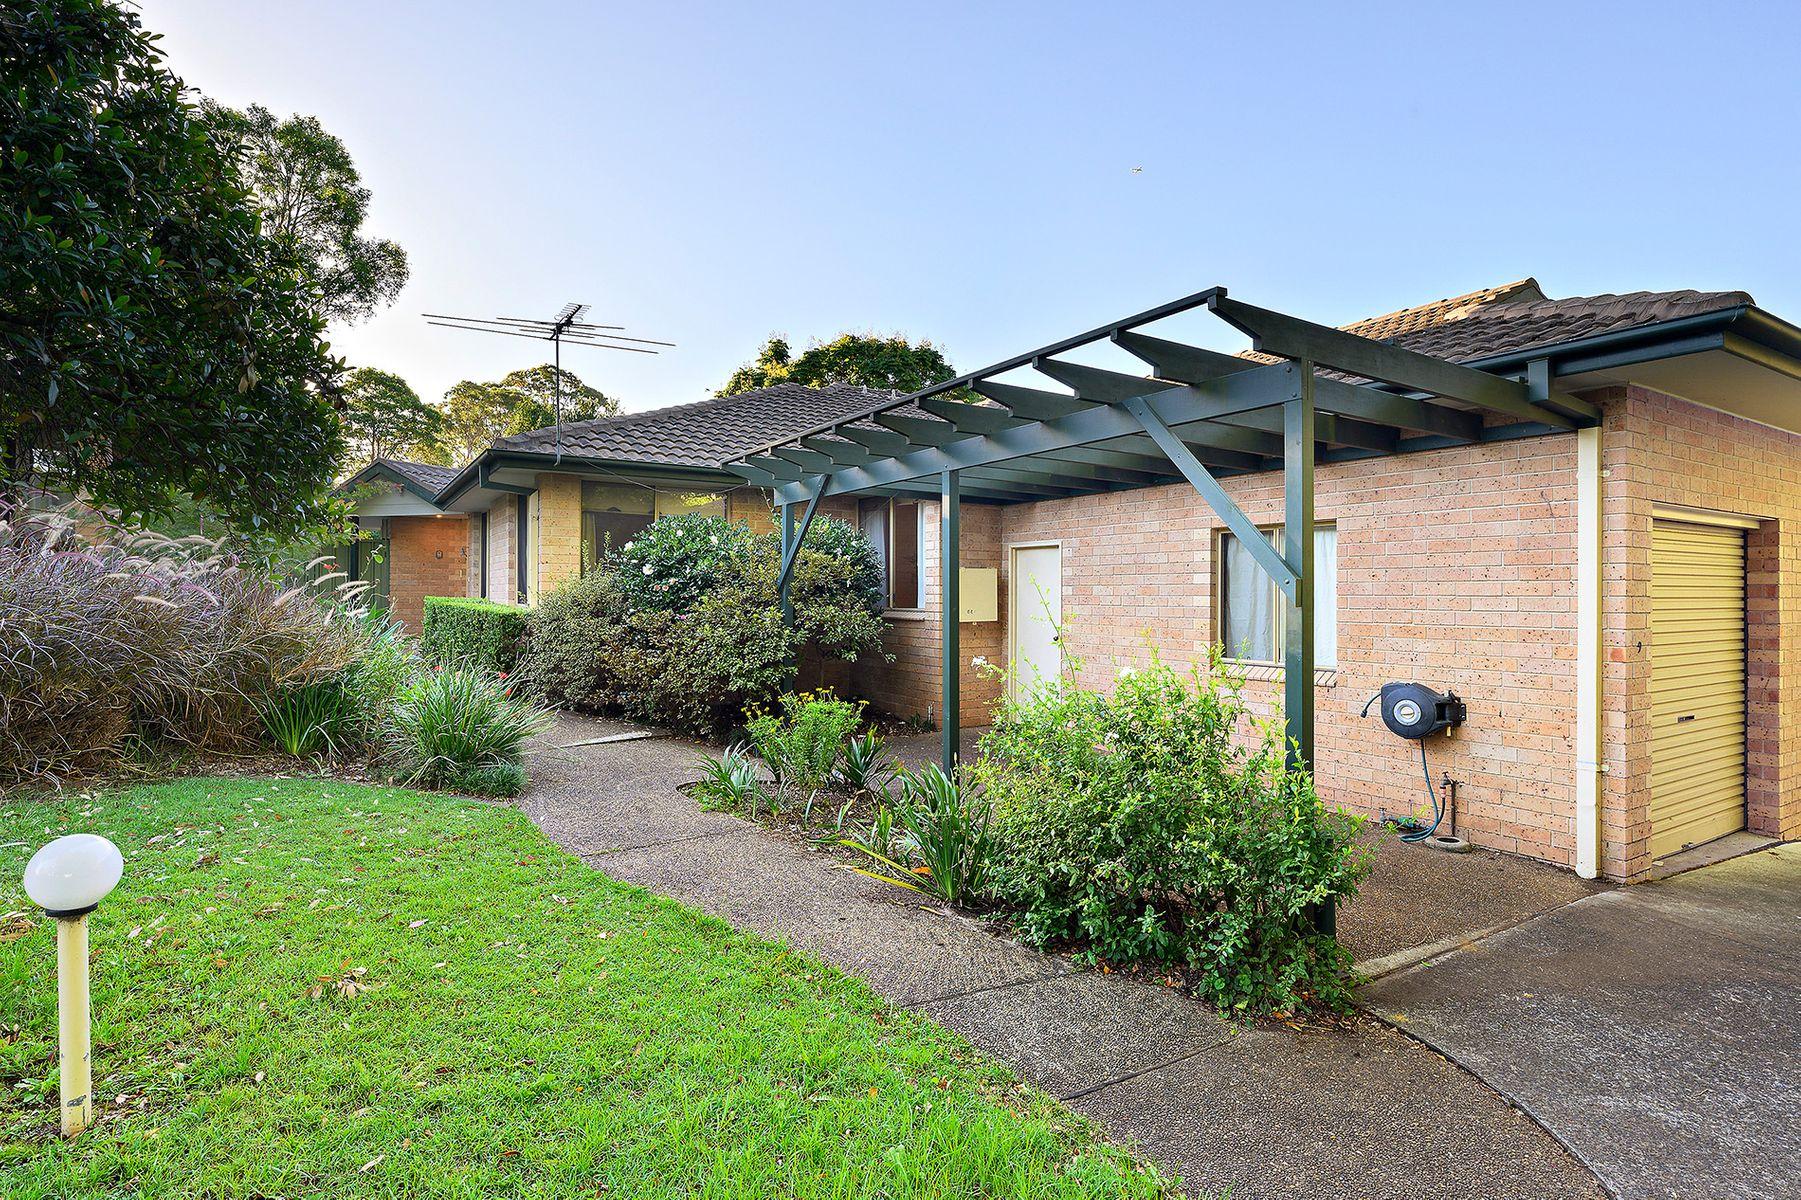 9/269-271 Malton Road, North Epping, NSW 2121